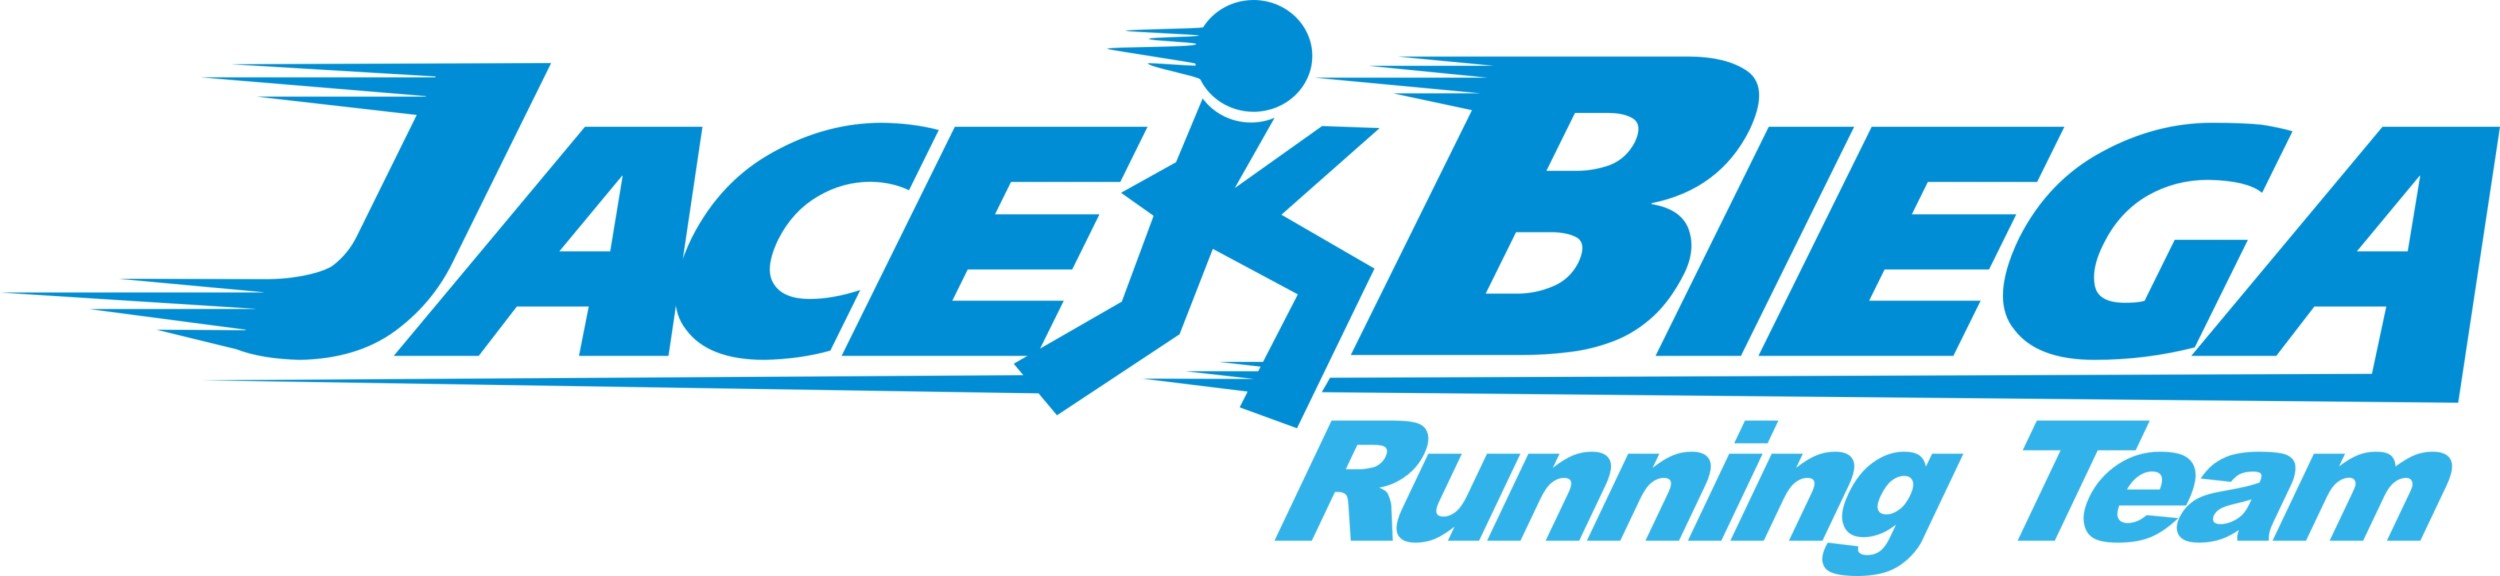 JacekBiega-Running-Team-nieb